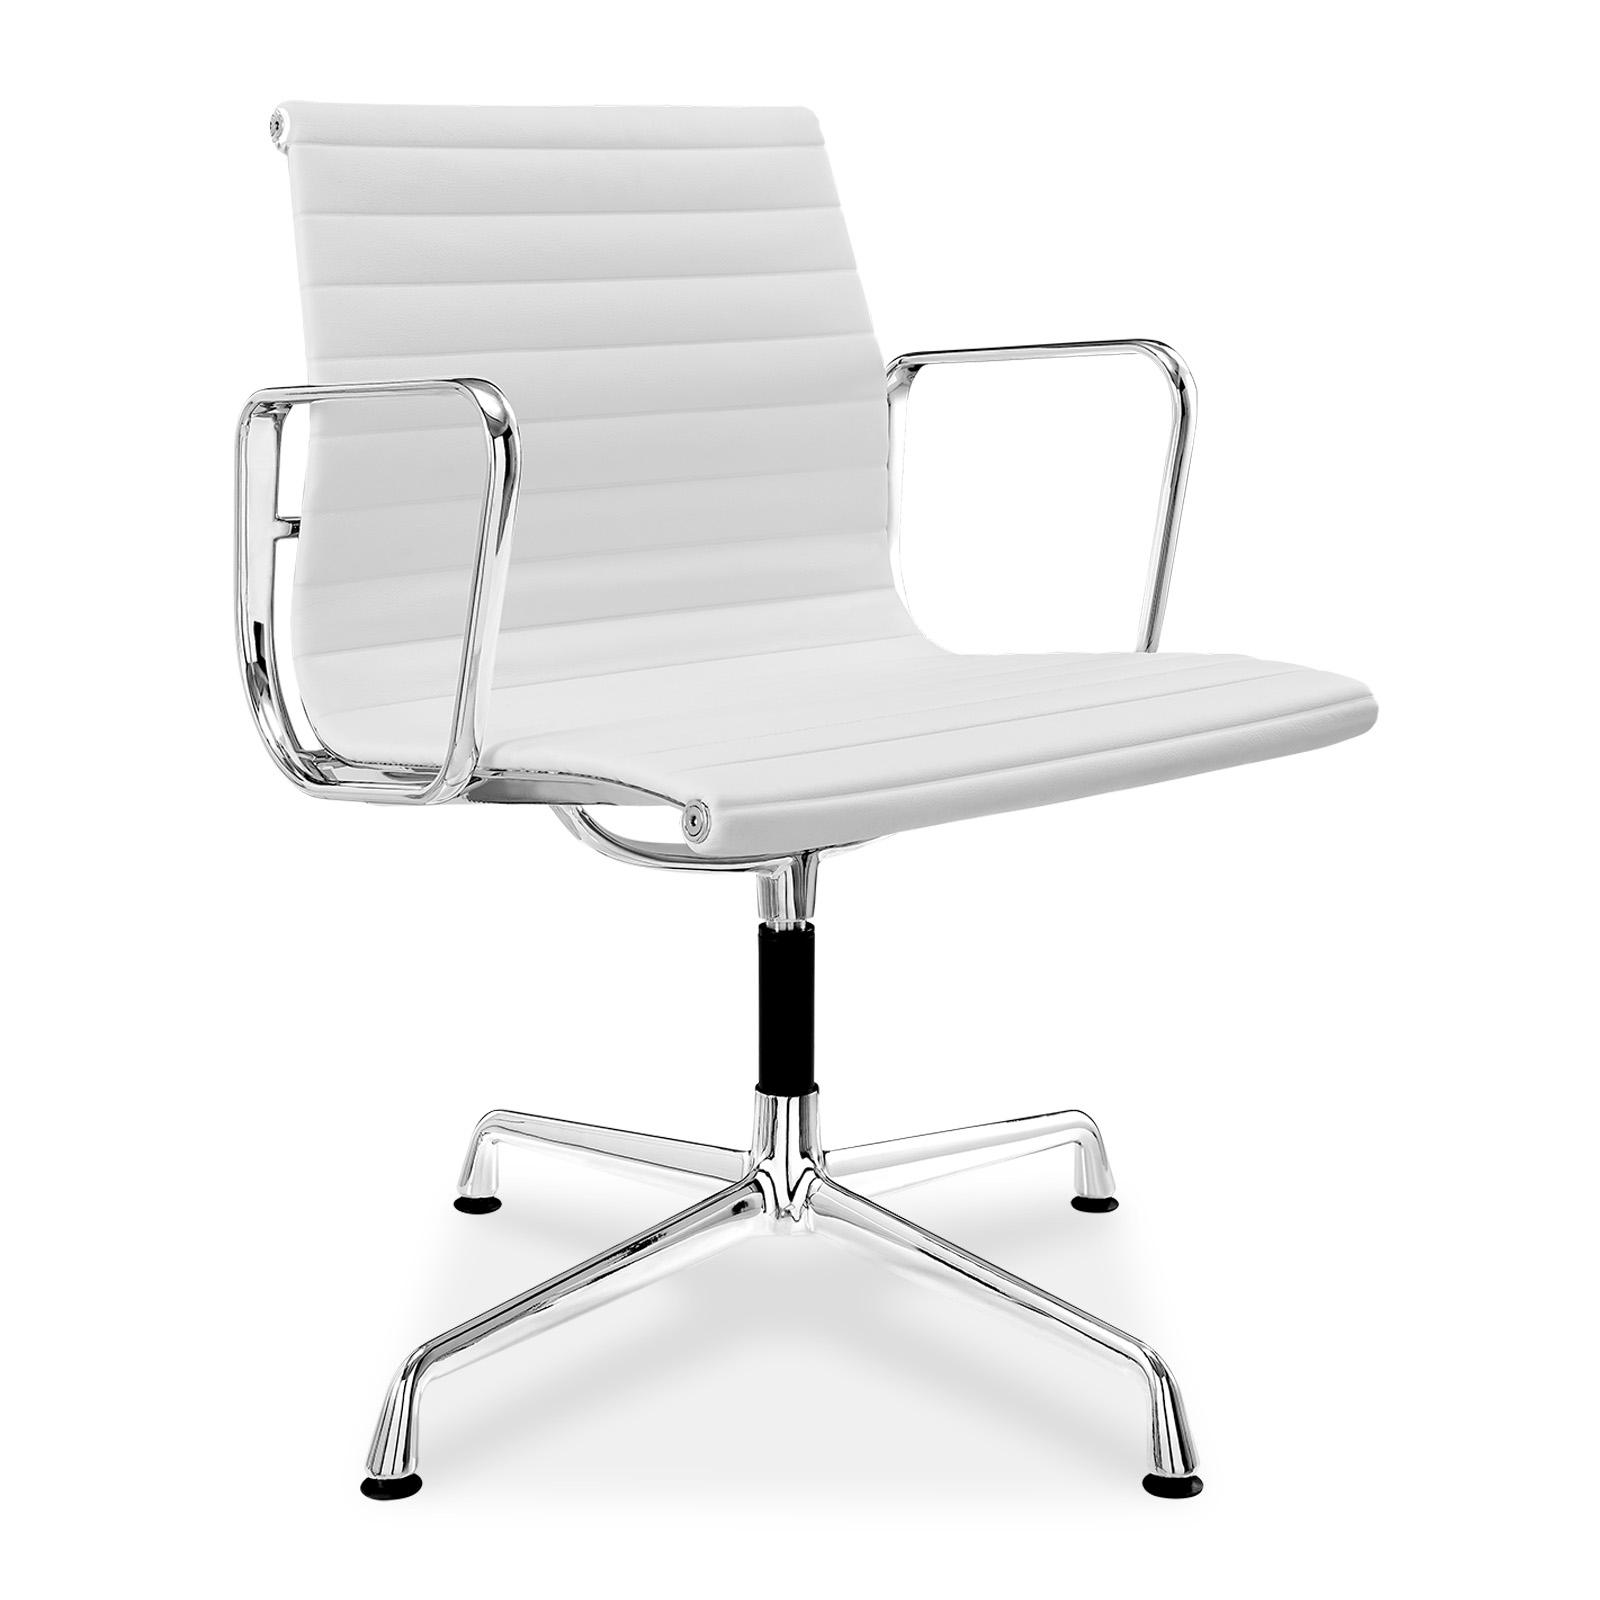 Charles Eames Bureaustoel.Eames Bureaustoel Ea 108 Wit Chair Modern Furniture New Homes